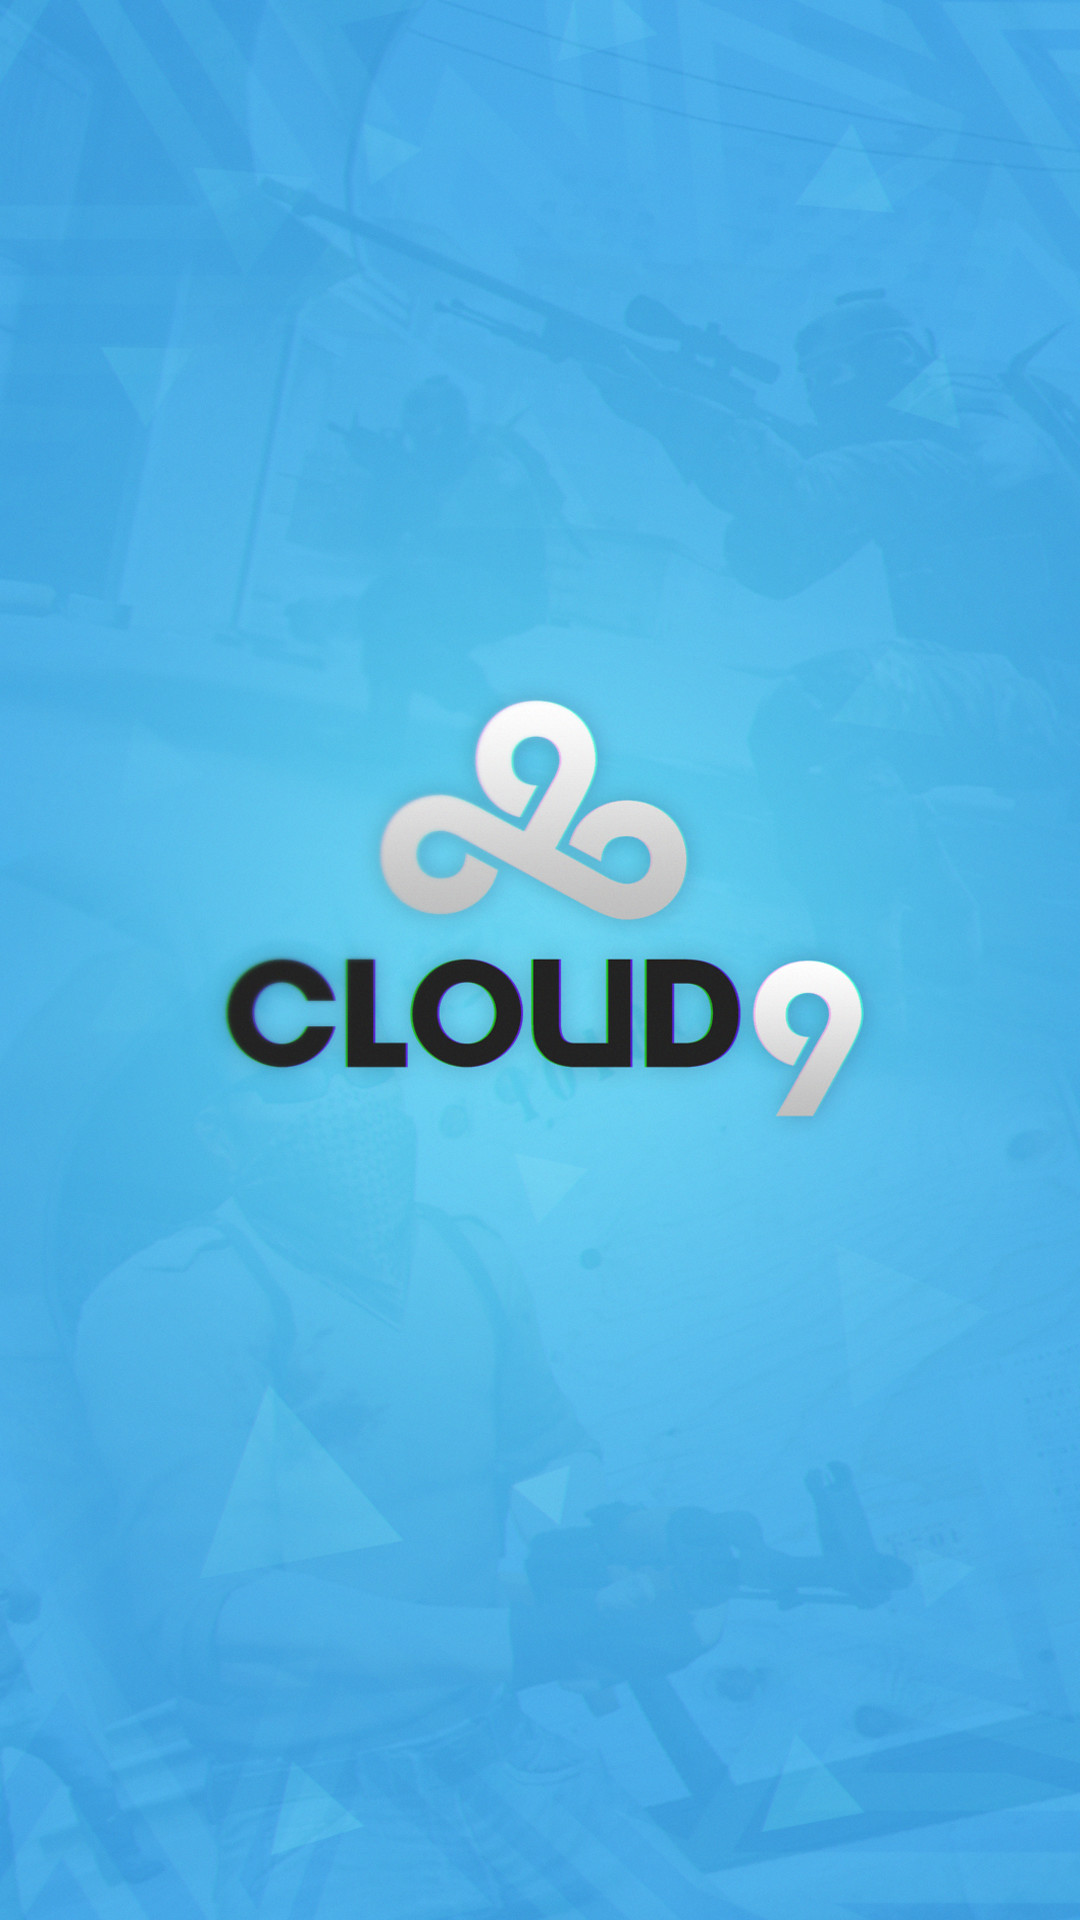 67 Cloud 9 Iphone